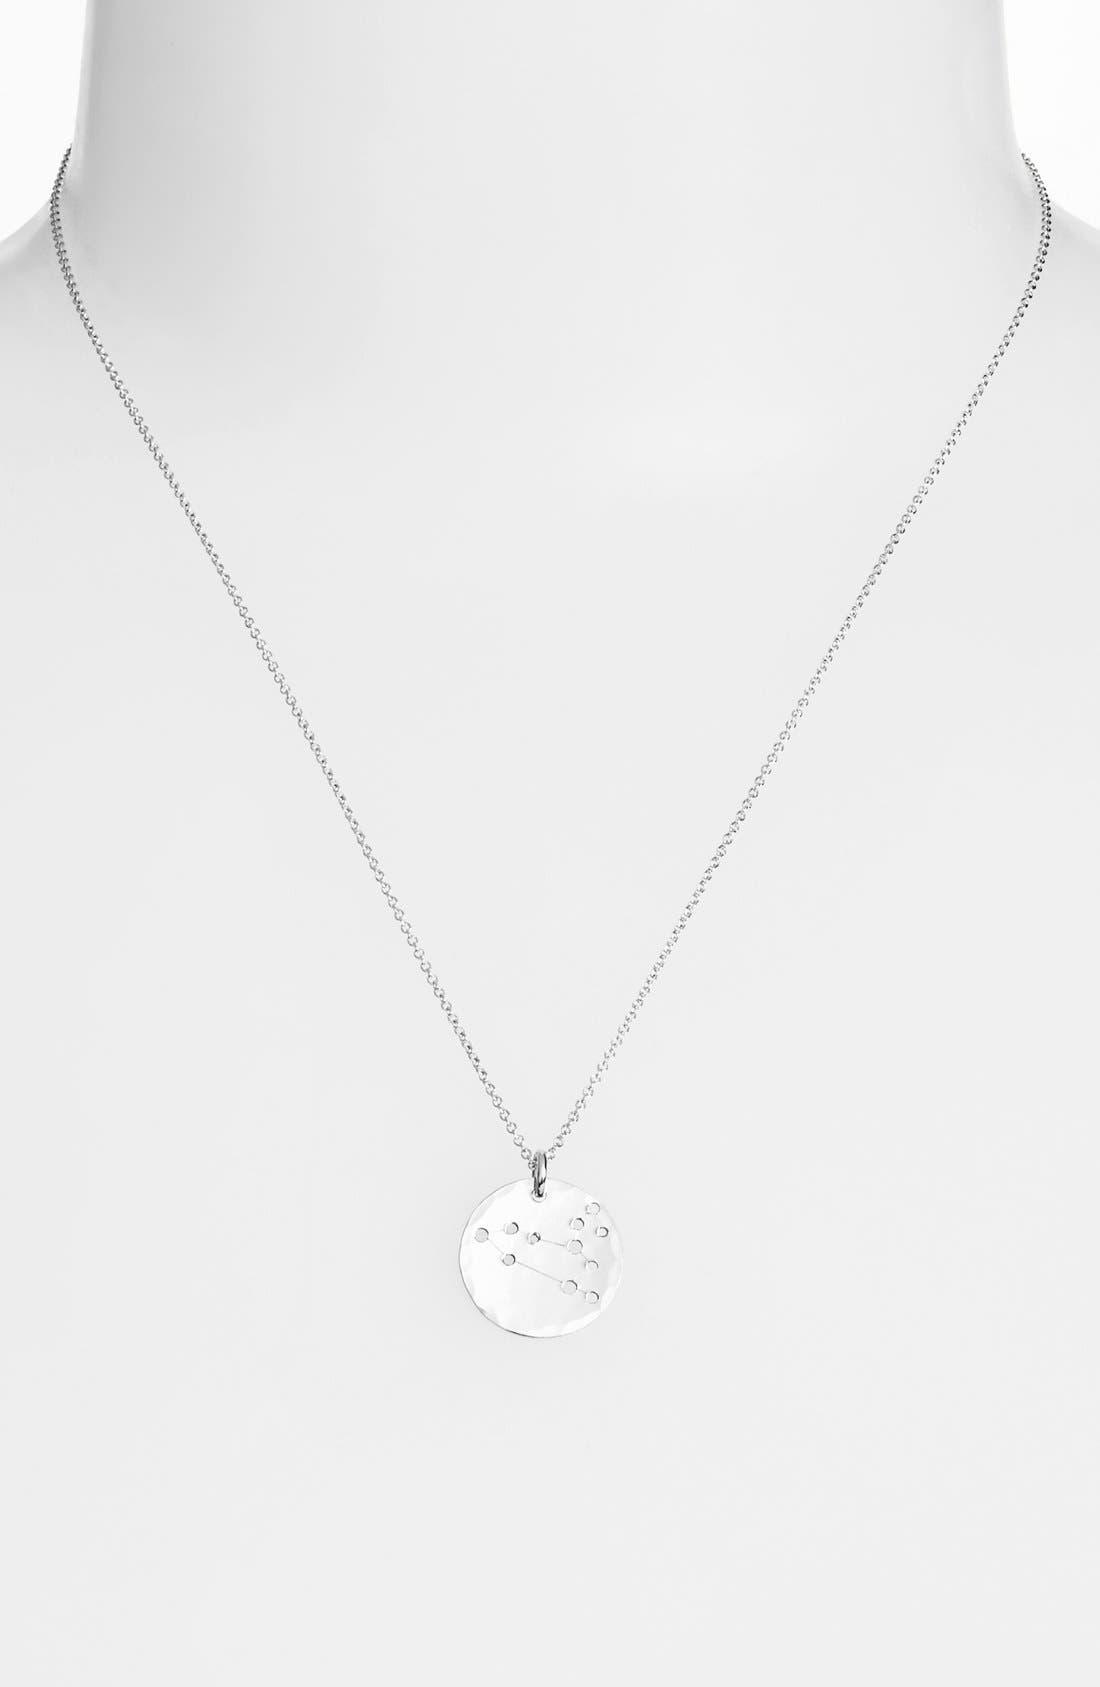 Ija 'Small Zodiac' Sterling Silver Necklace,                             Main thumbnail 5, color,